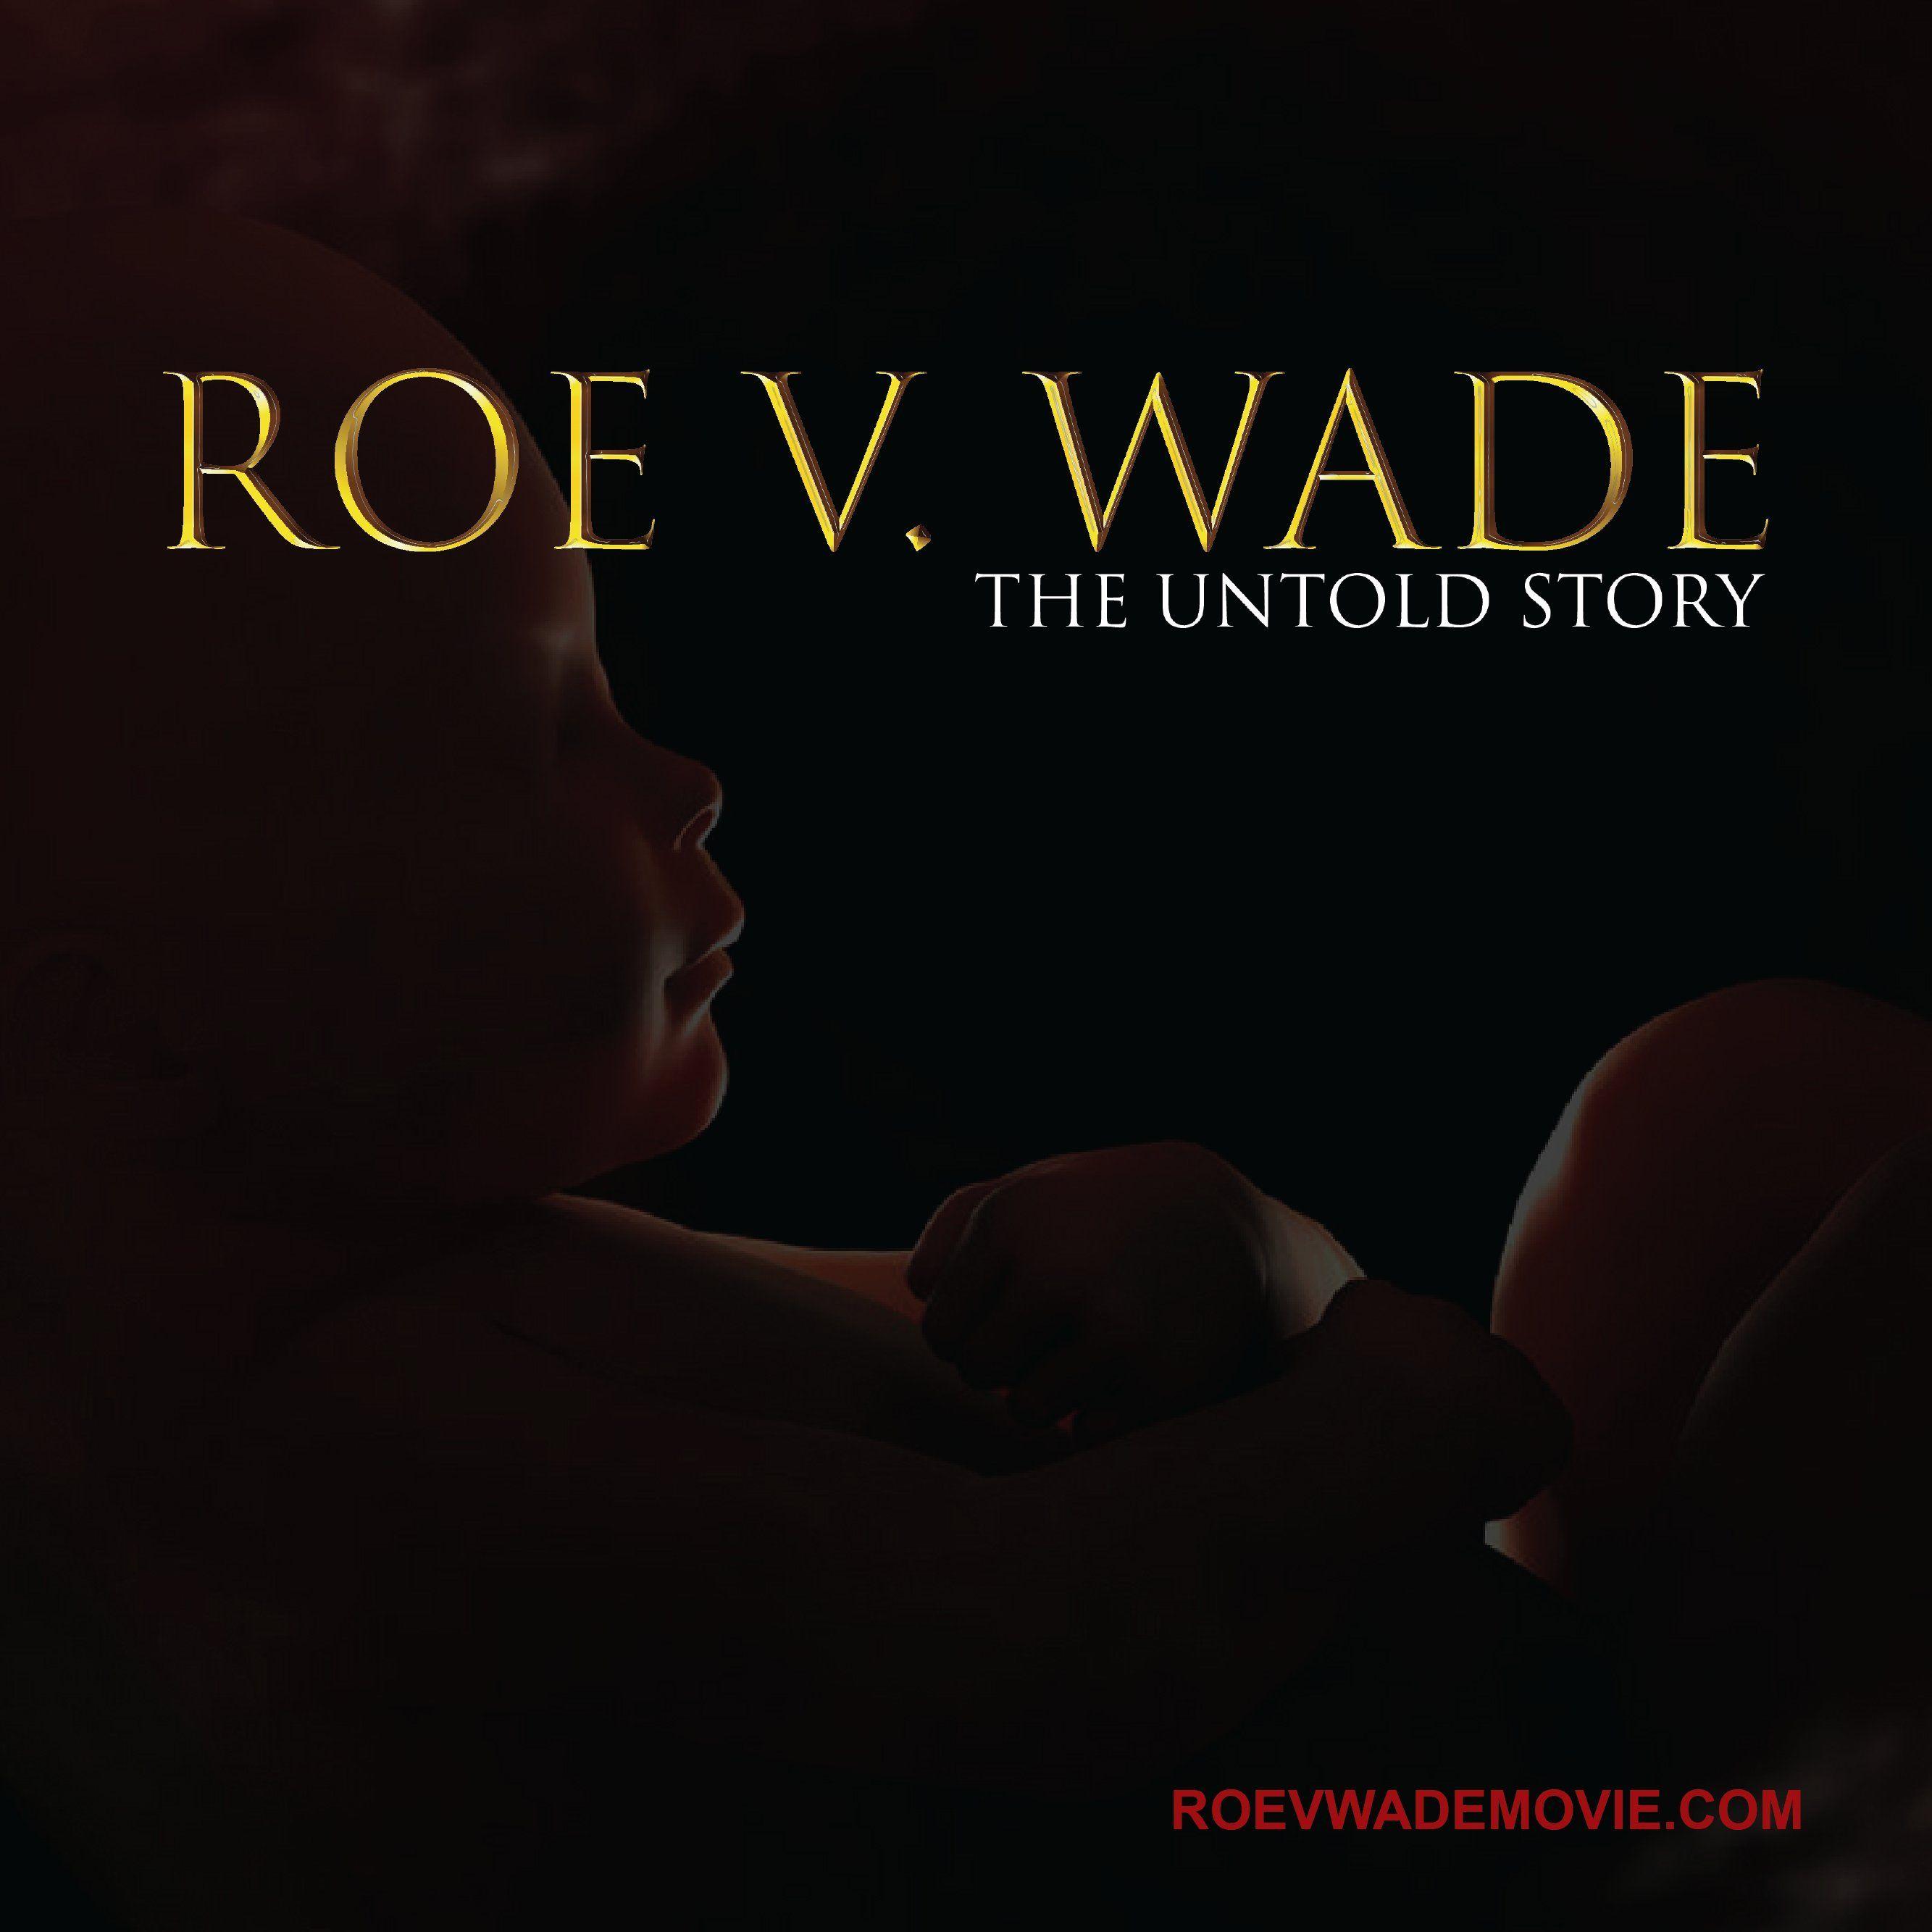 ROE V. WADE the Movie FreeStartr RoevWadeMovie https